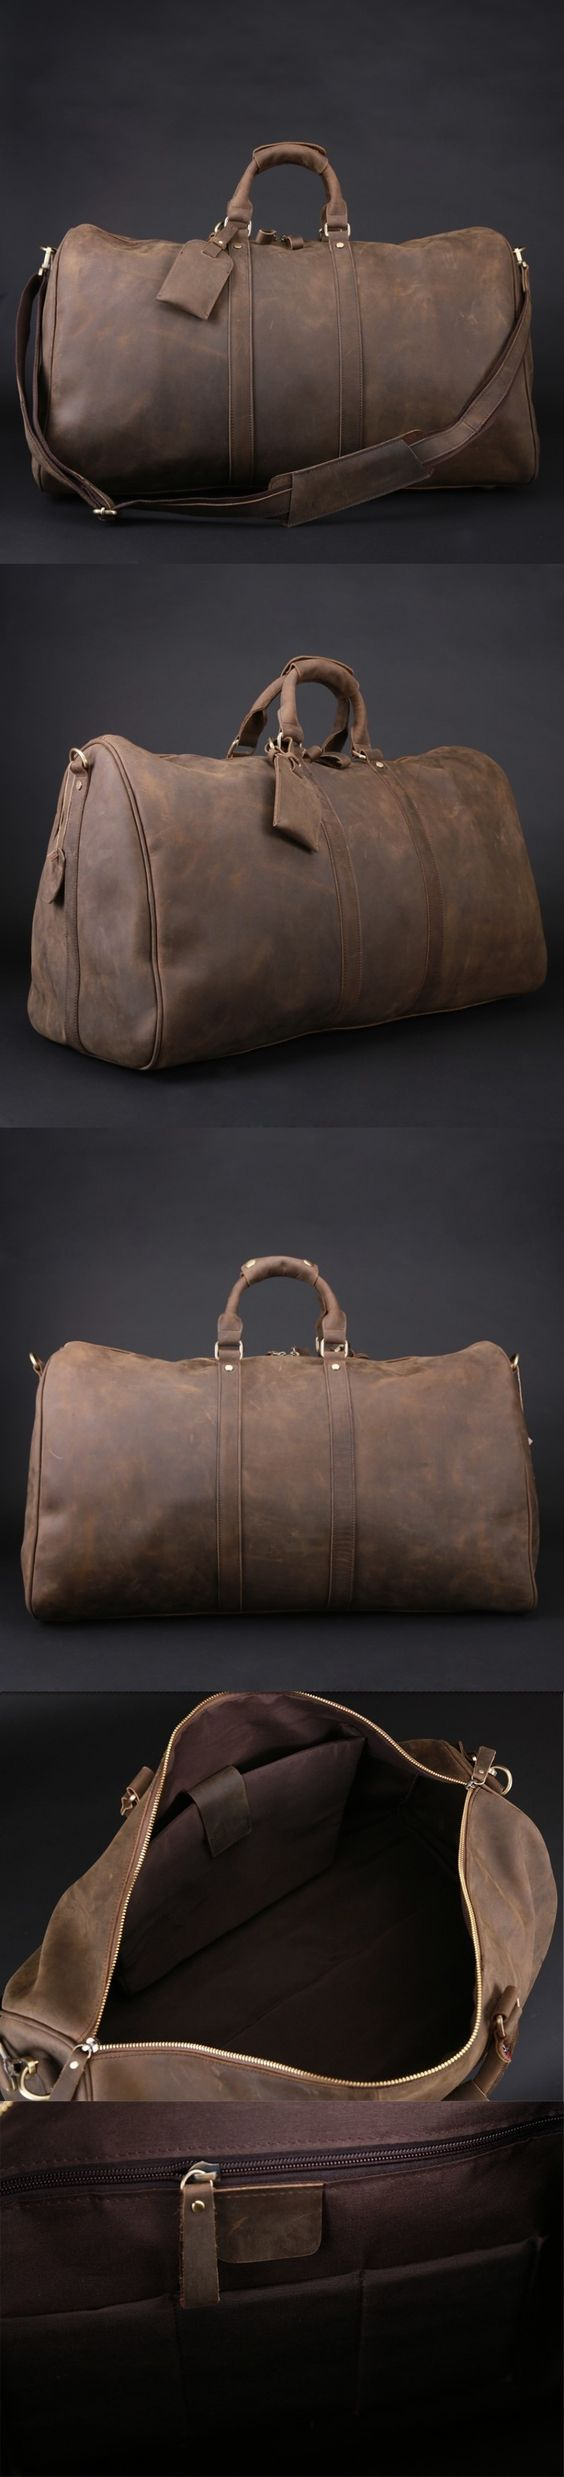 Men's Handmade Vintage Leather Travel Bag / Luggage / Duffle Bag / Sport Bag / Weekend Bag